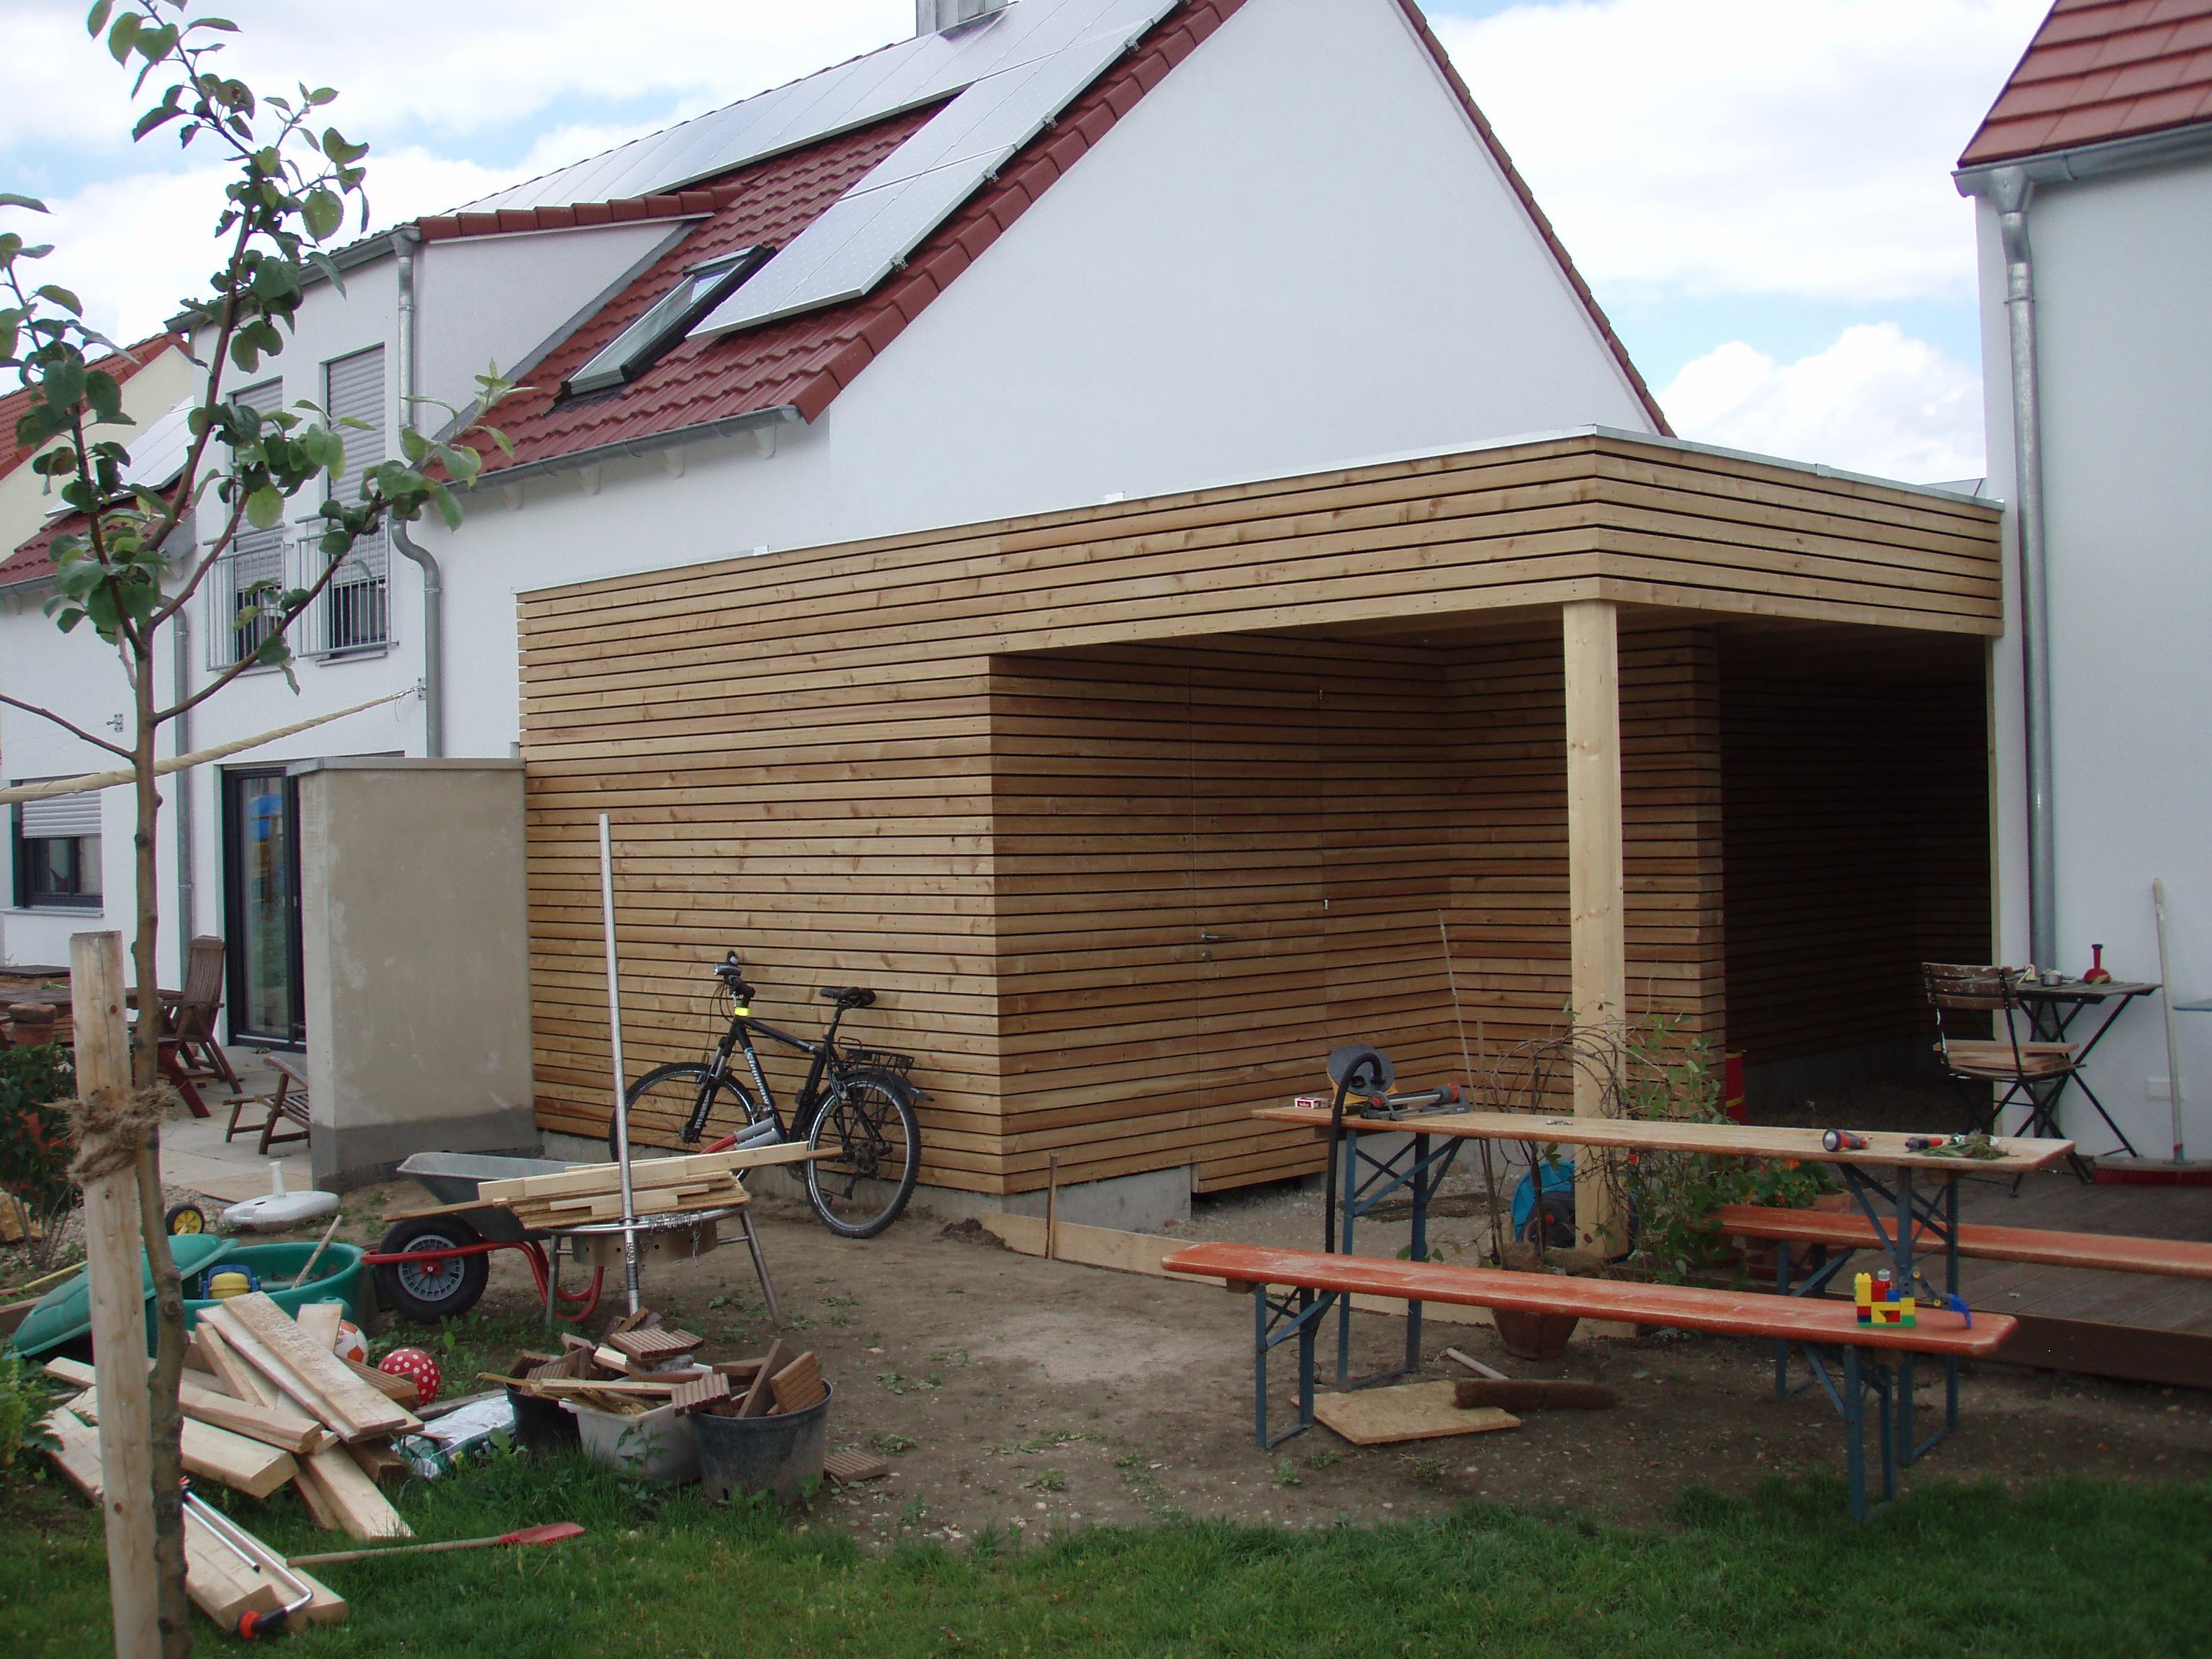 chiemgau werkstatt carport in regensburg. Black Bedroom Furniture Sets. Home Design Ideas